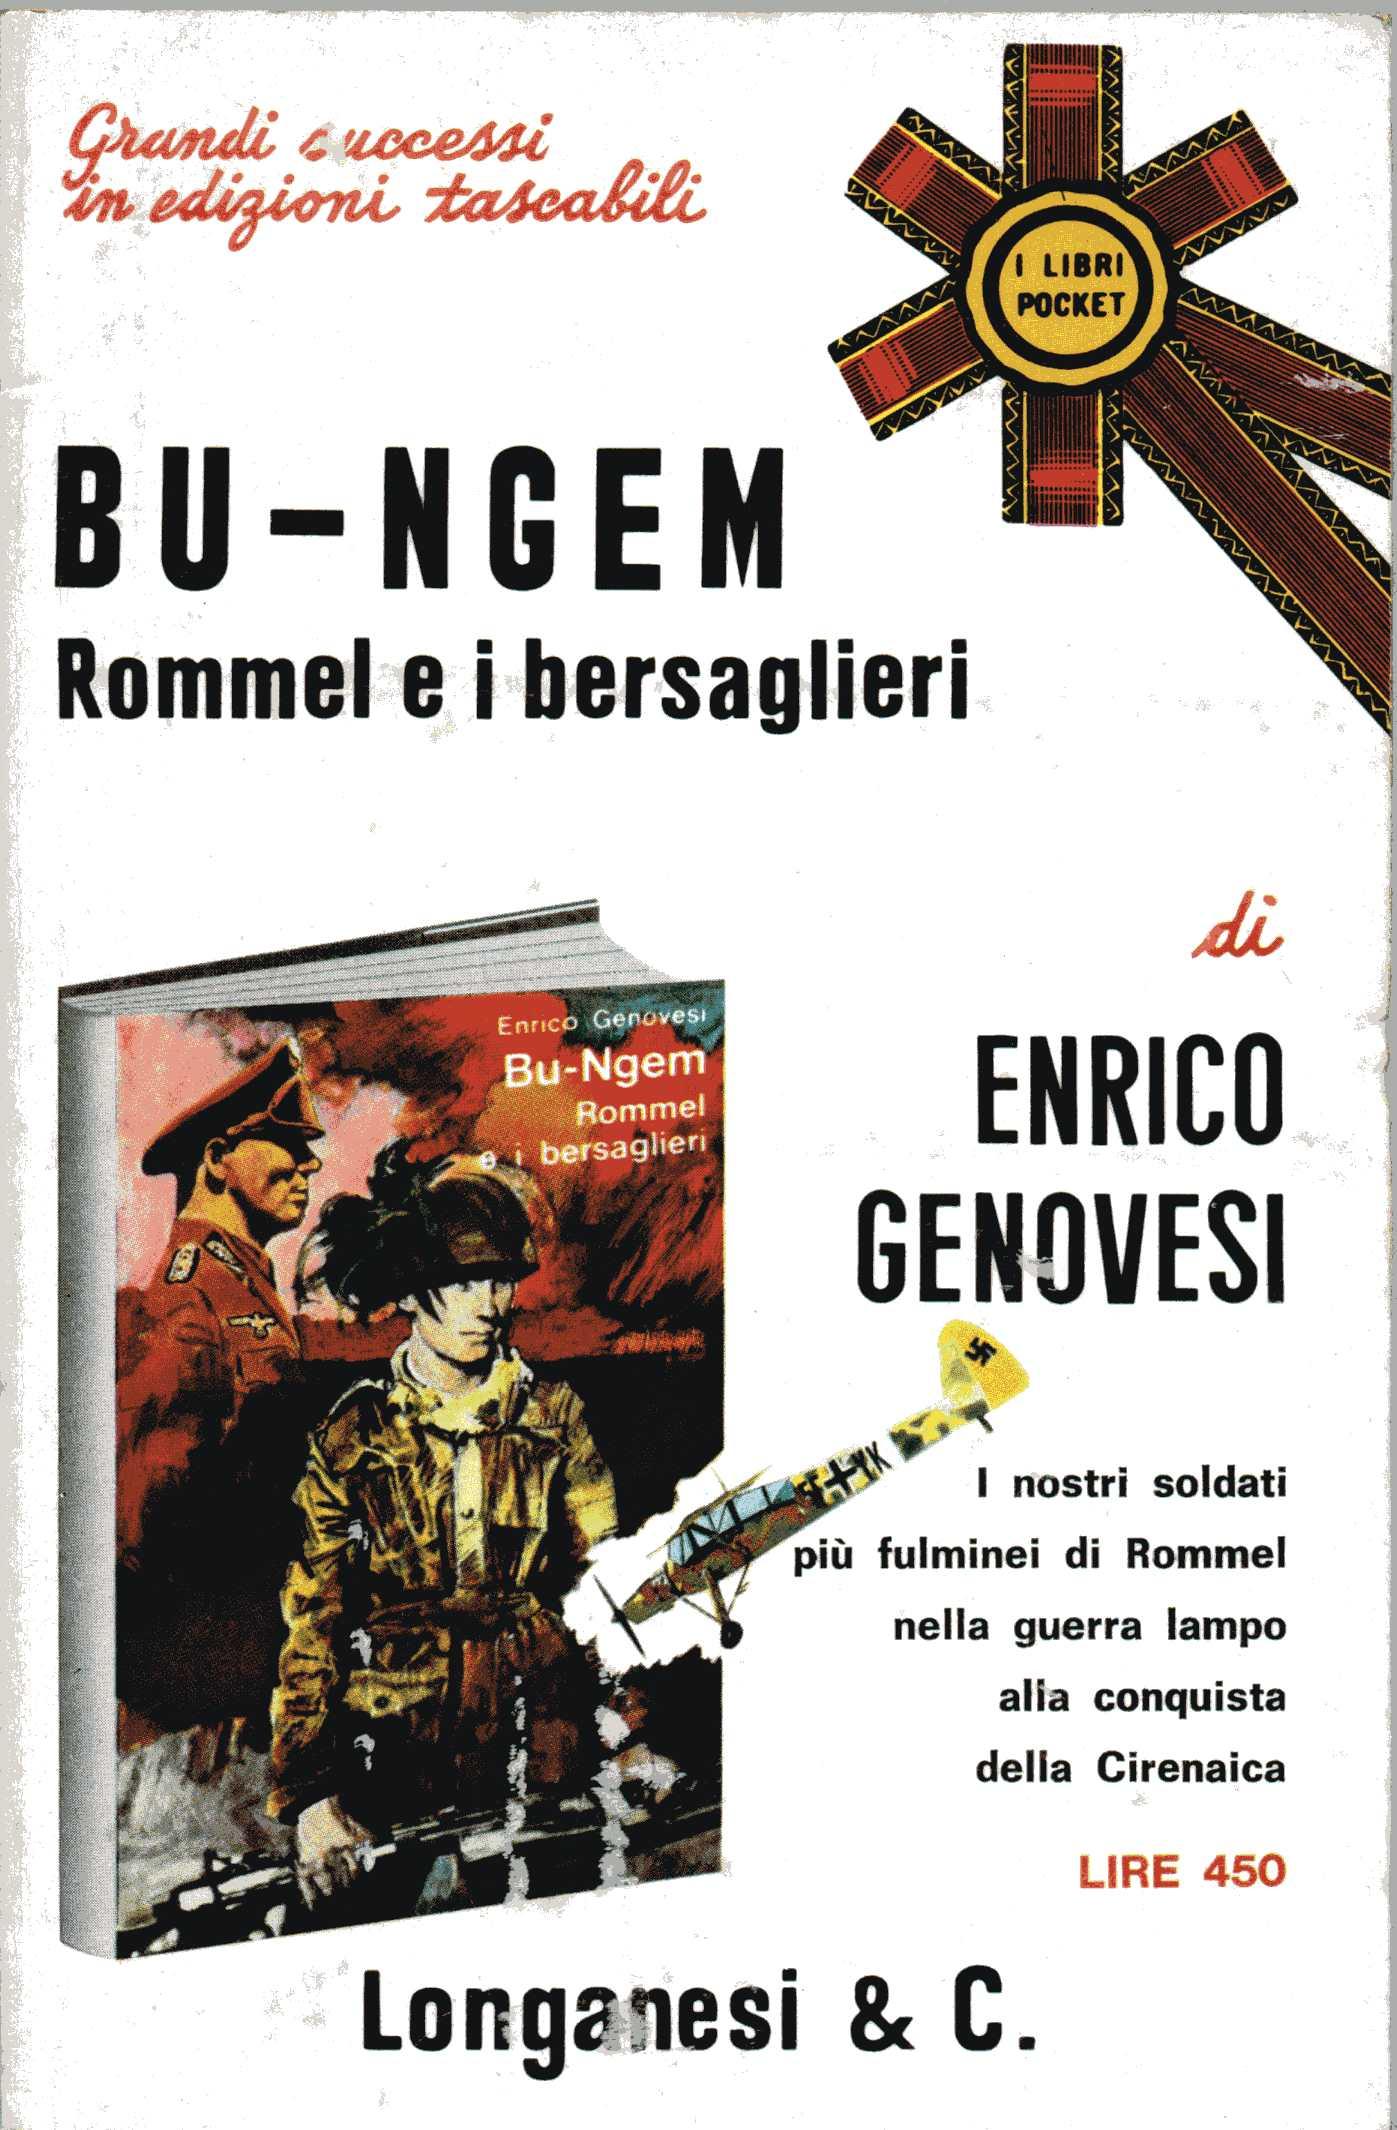 BU-NGEM Rommel e i bersaglieri